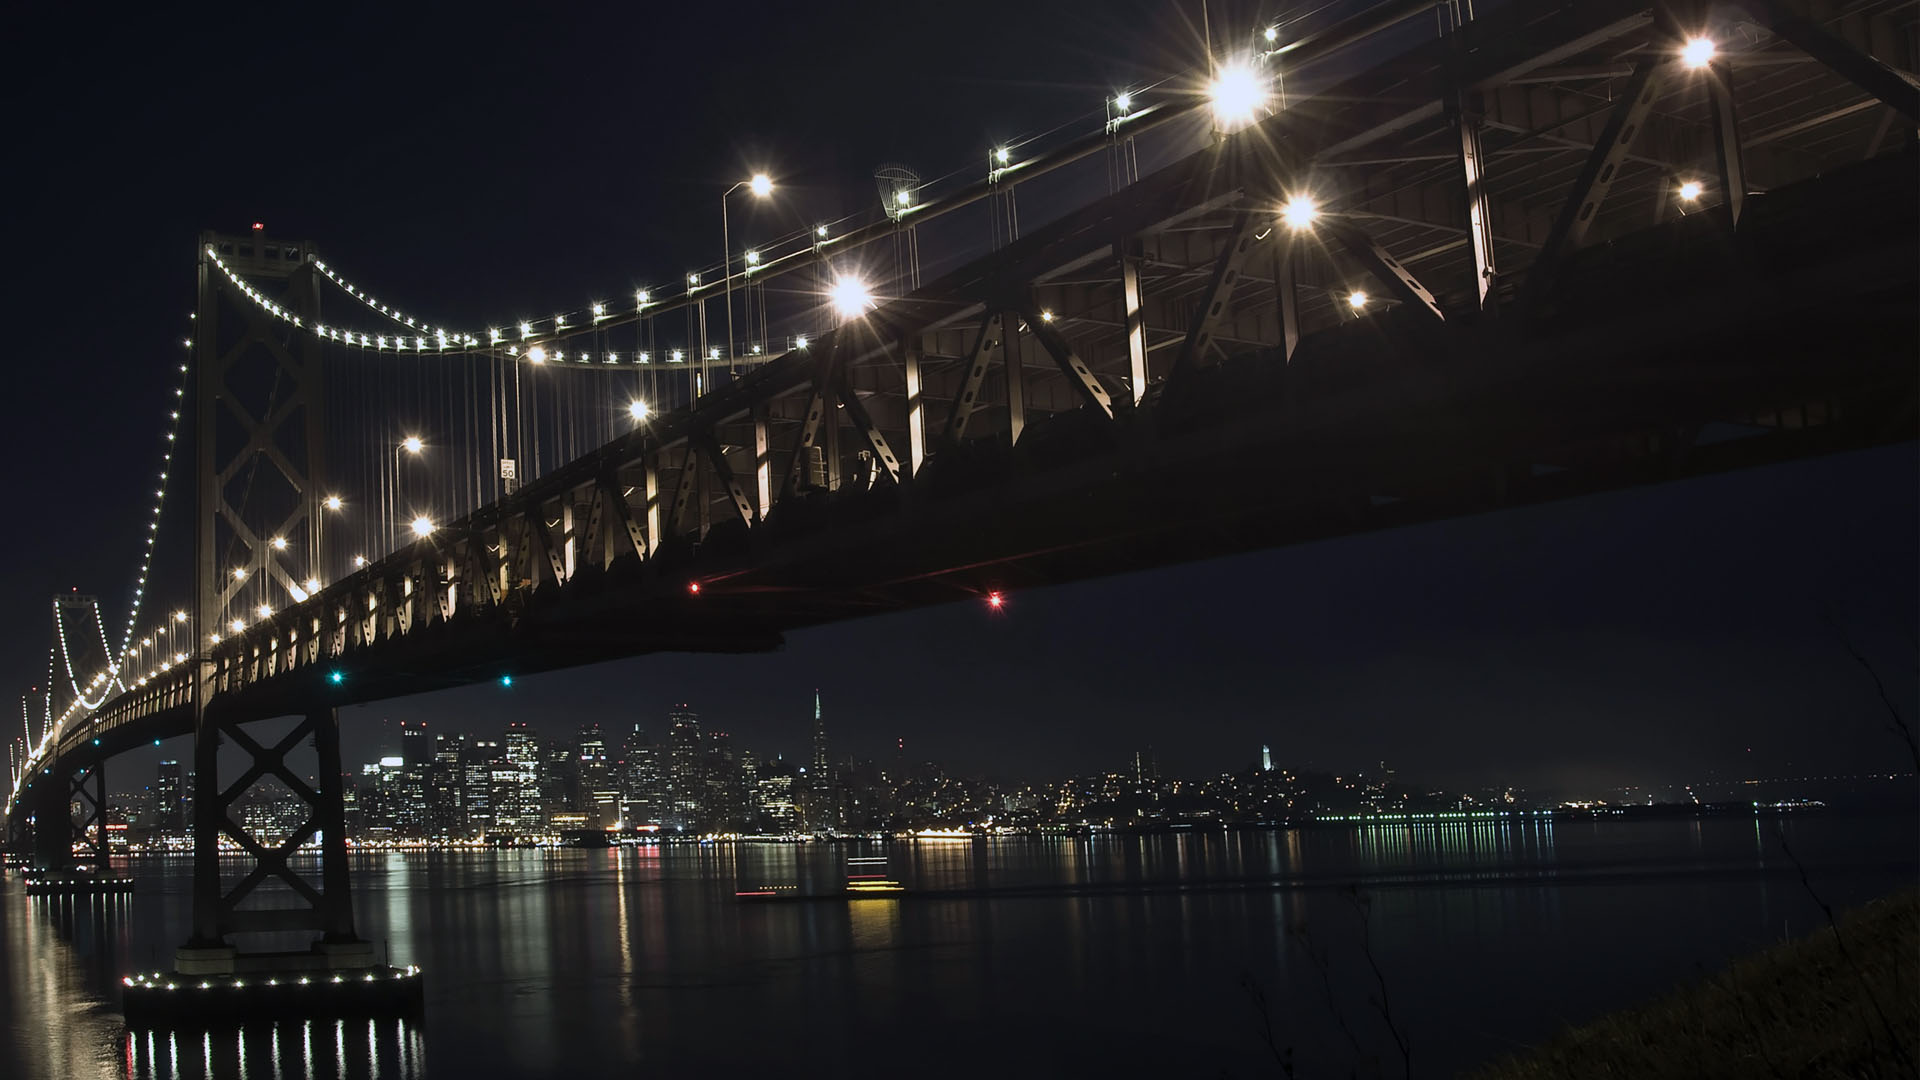 night wallpaper bridge francisco 1920x1080 1920x1080